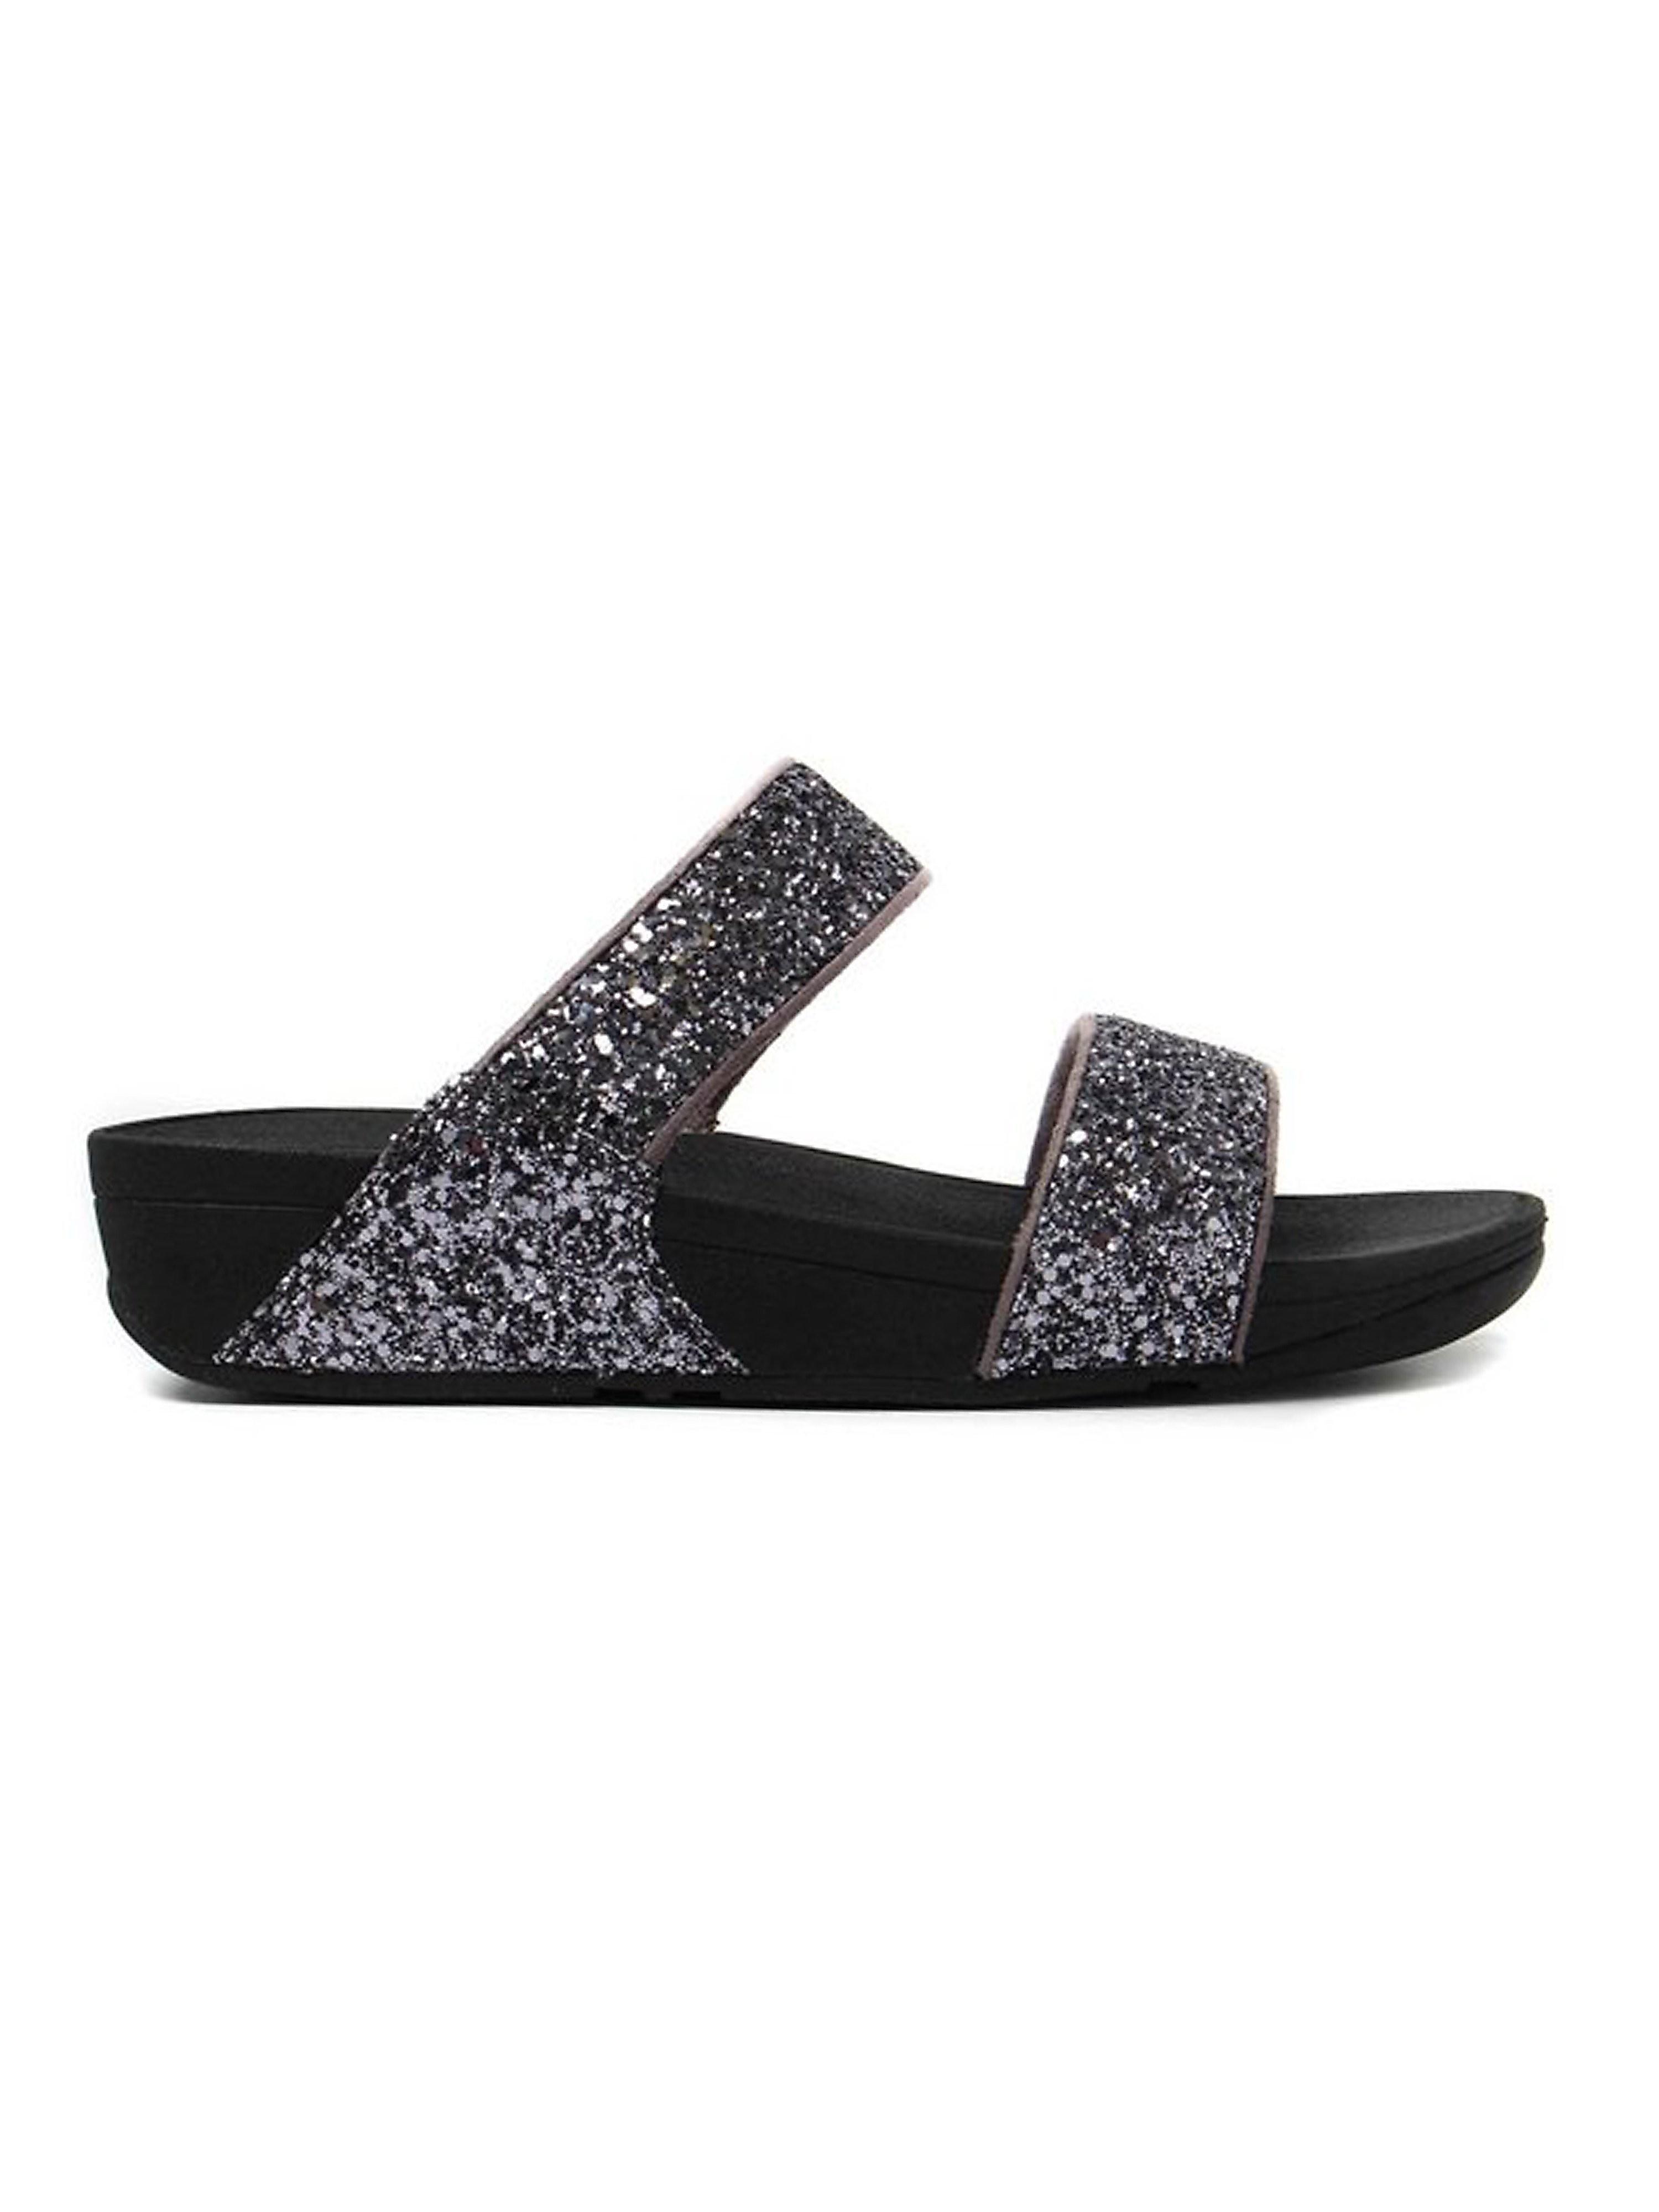 FitFlop Women's Glitterball Slide Sandals - Pewter